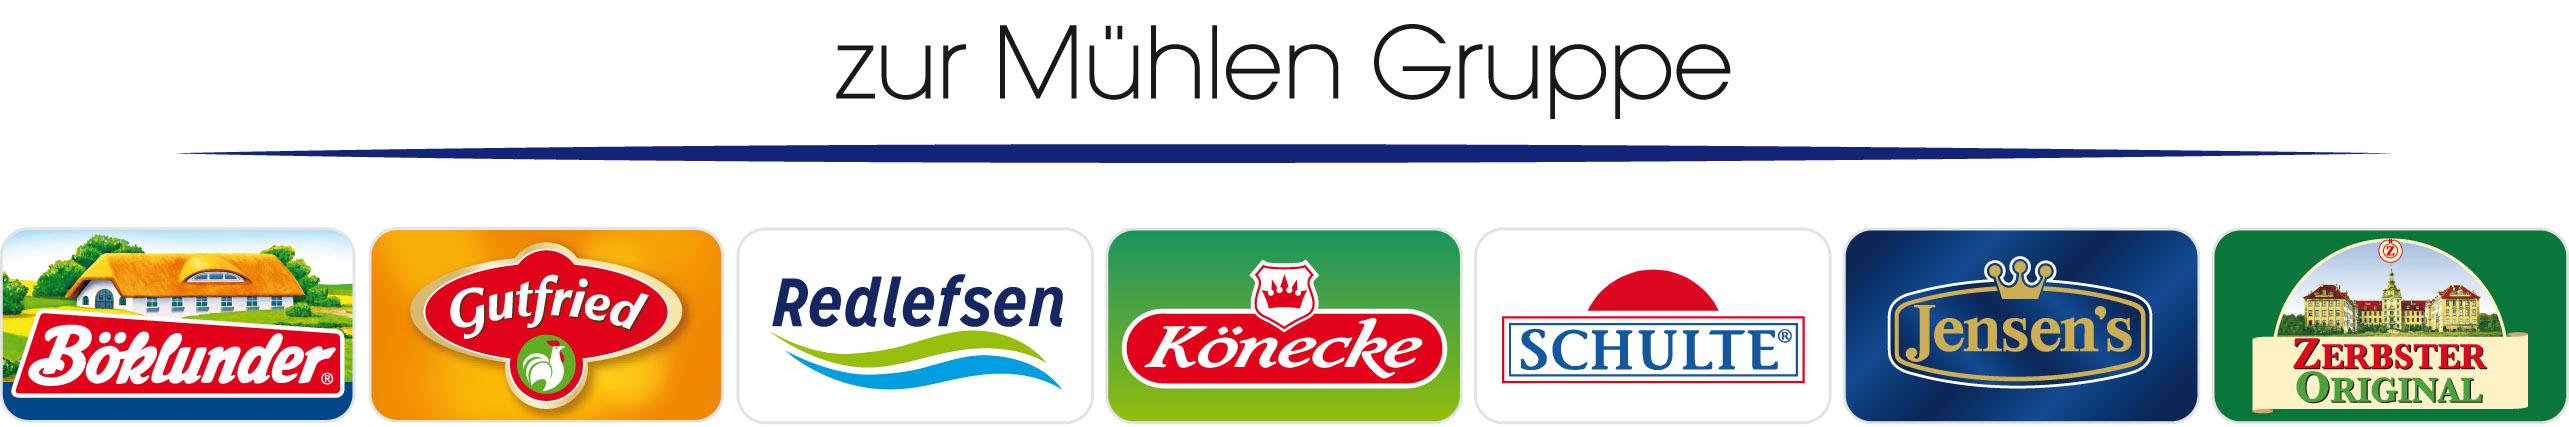 Könecke Wurstfabrikation GmbH & Co. KG